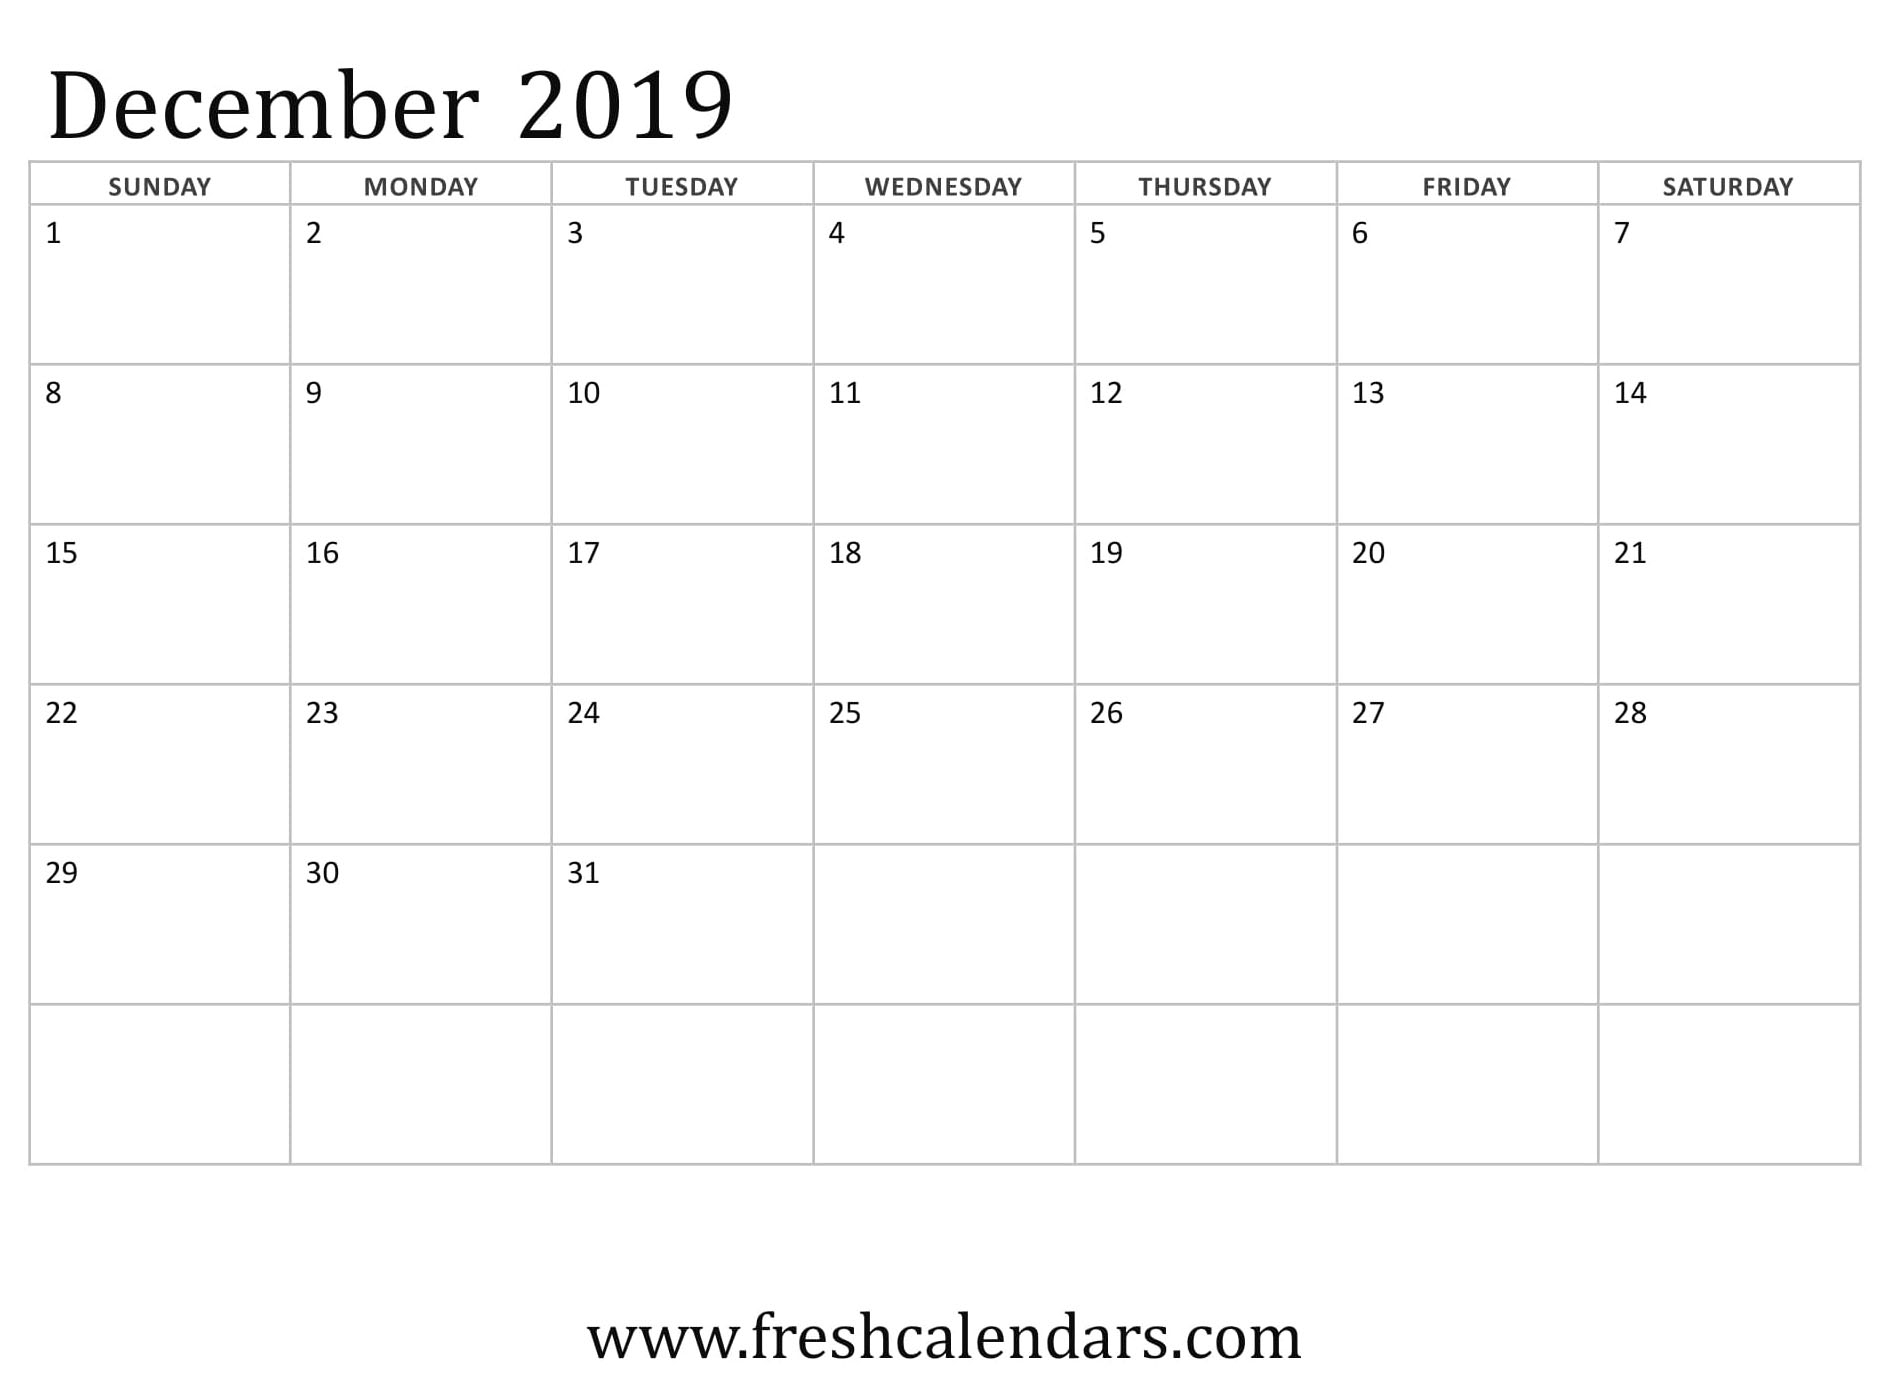 Blank December 2019 Calendar Printable Templates regarding Blank Writable Calendar Template Large December Calendar Com